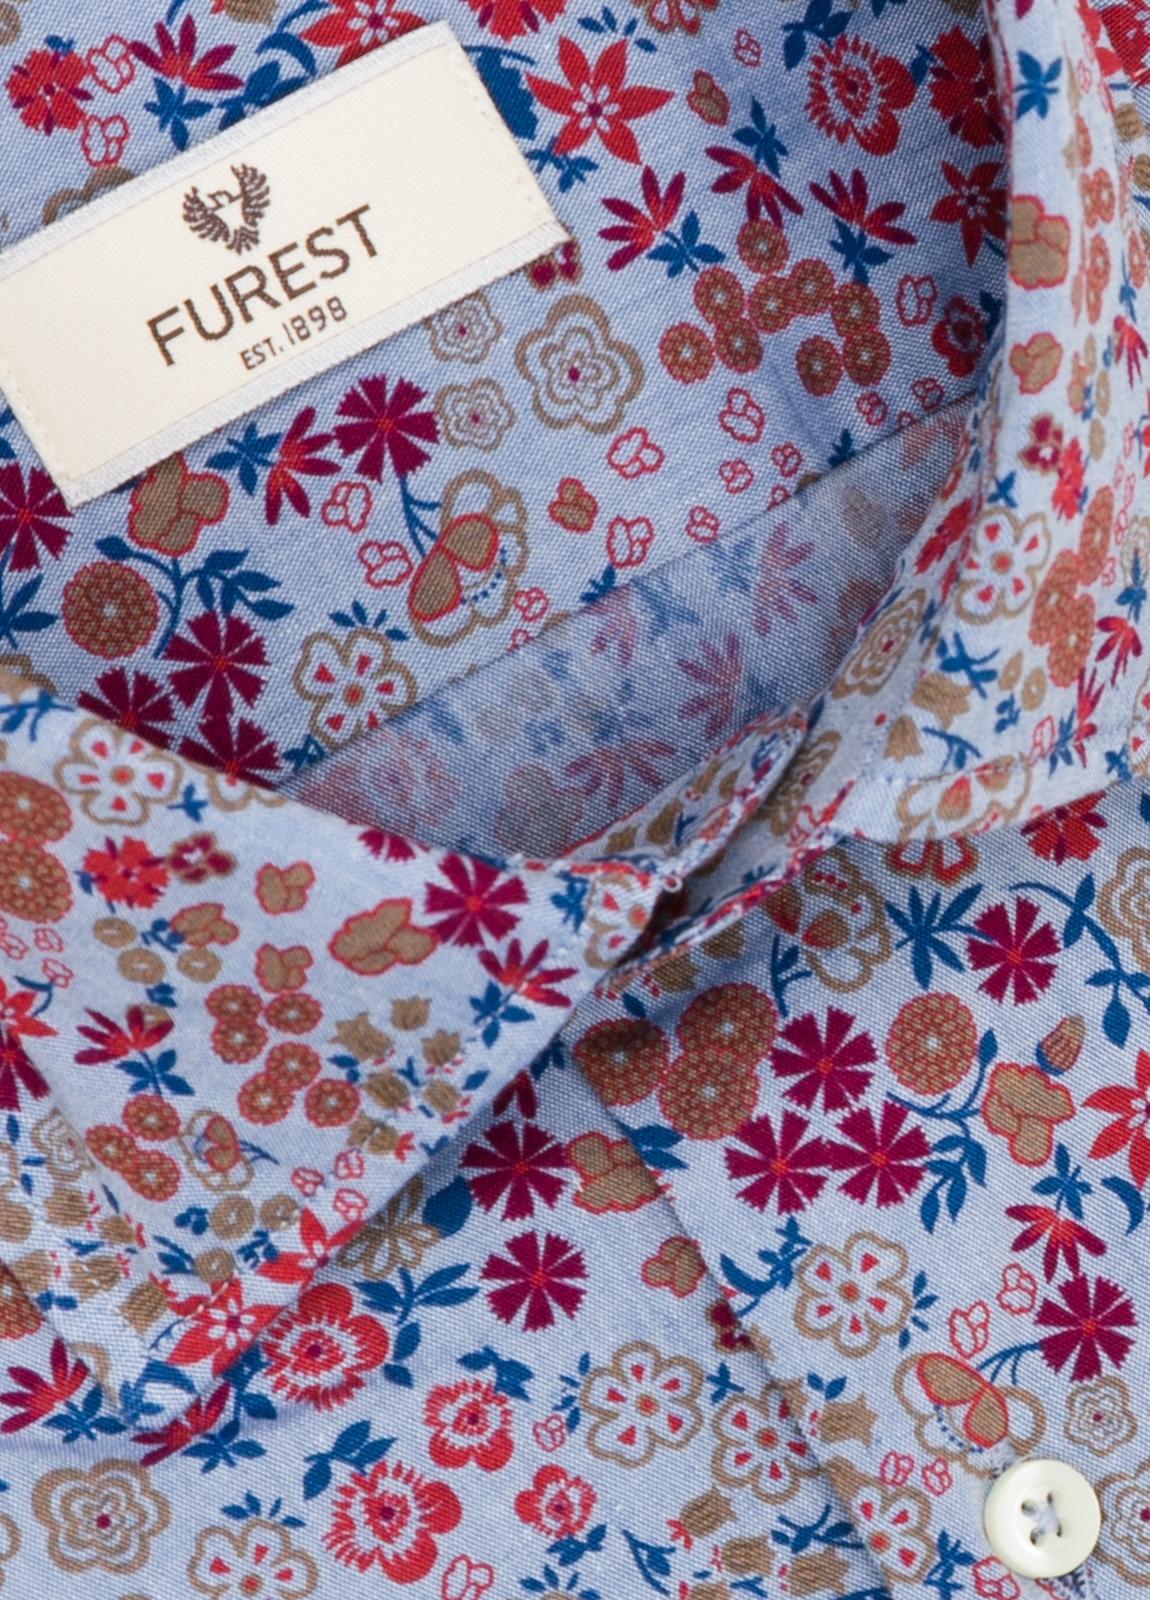 Camisa Leisure Wear SLIM FIT modelo PORTO dibujo floral fondo blanco. 100% Algodón. - Ítem4